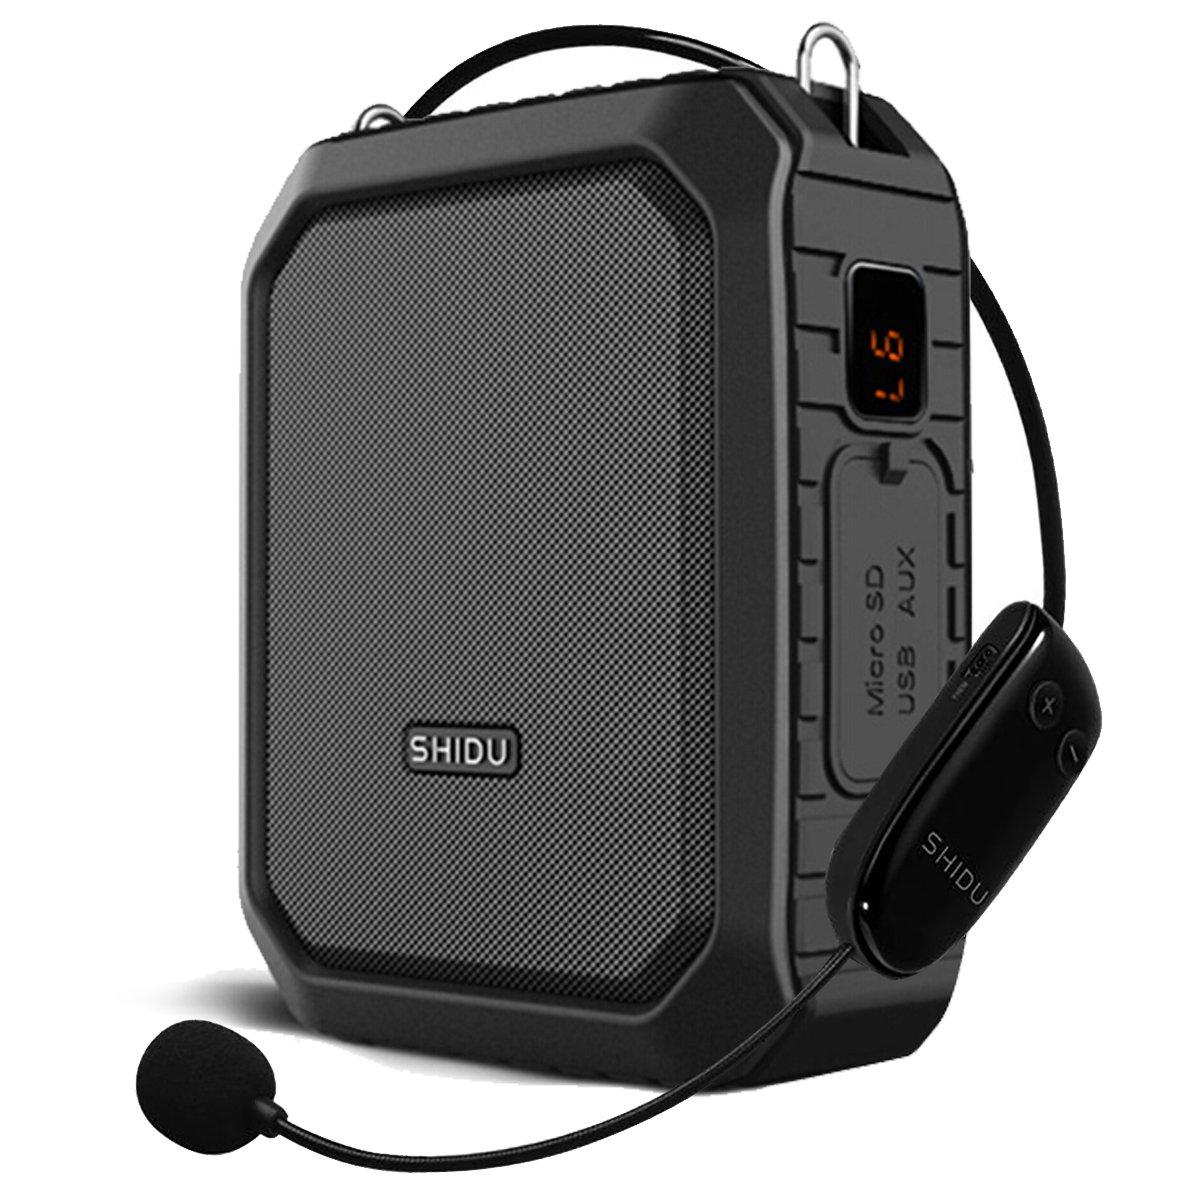 Bluetooth Voice Amplifier Speaker Waterproof, Microphone Amplifier Wireless Portable Megaphone Loudspeaker 18W Output for Outdoor, Teachers, Coaches, Elderly, Tour Guide, Etc. (800-Wireless Black) by ResponseBridge